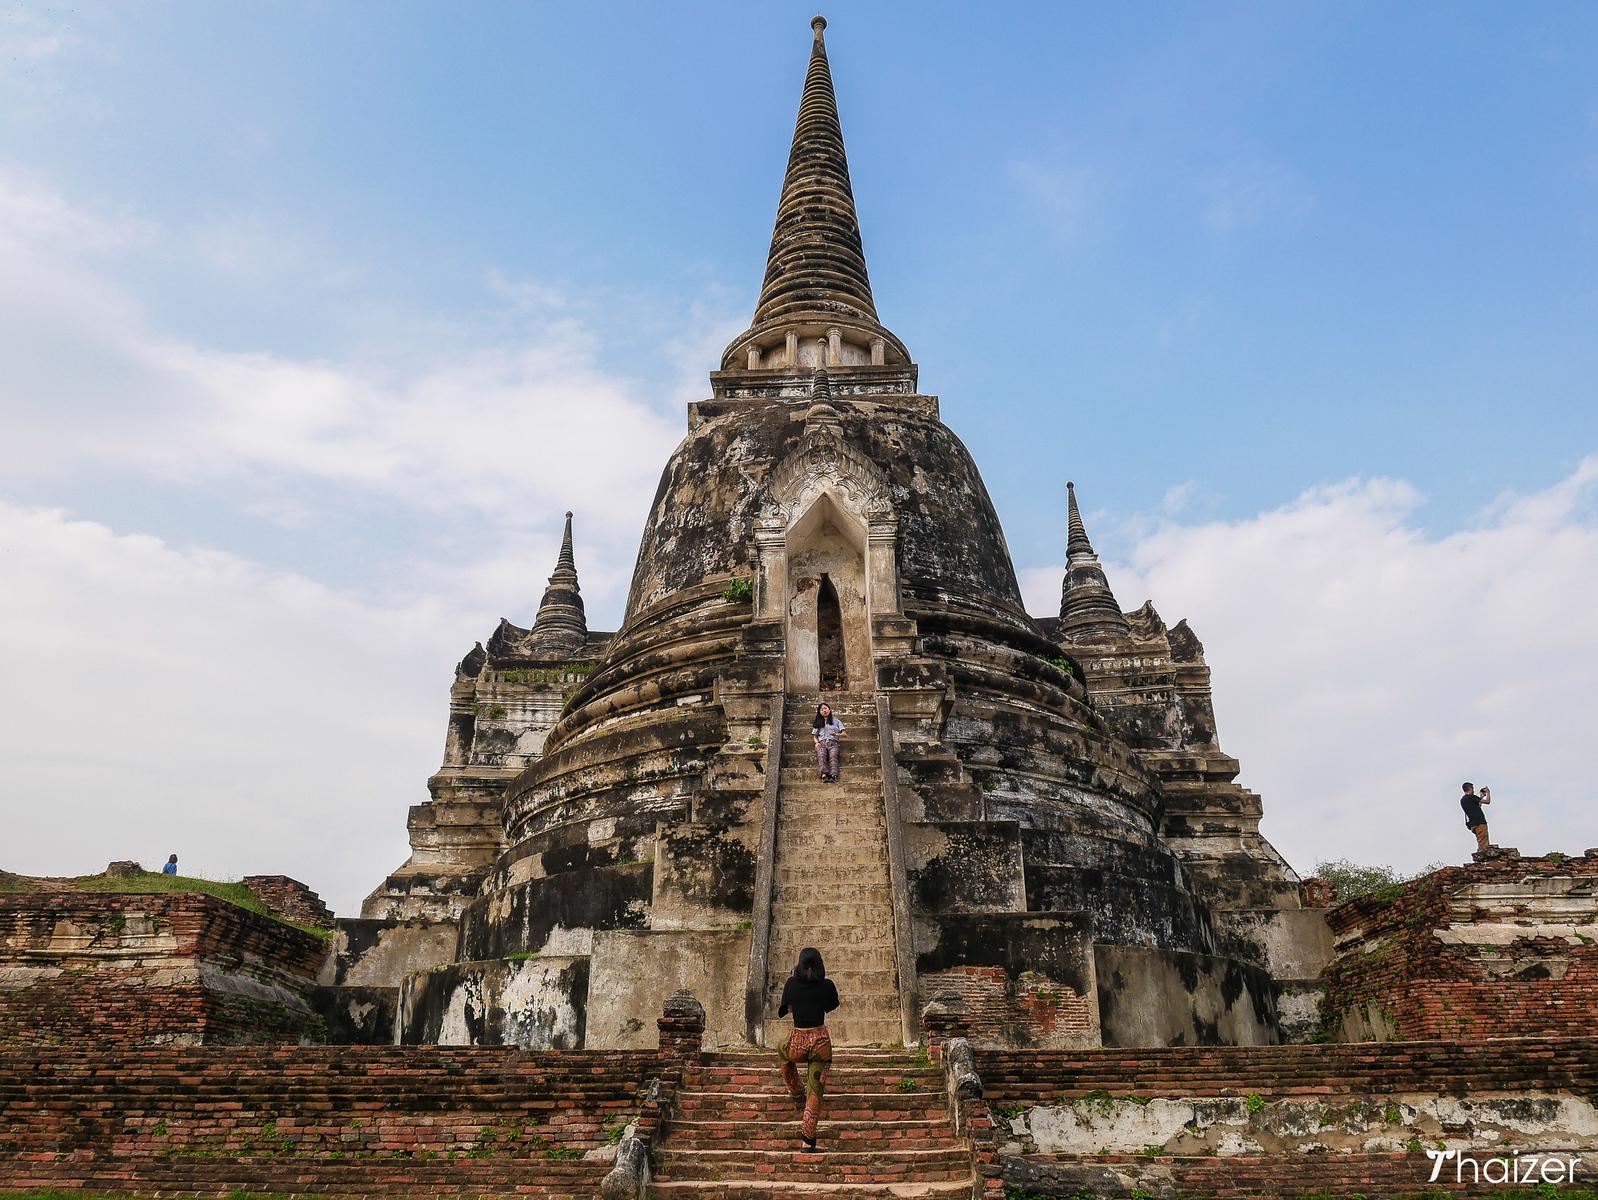 temple ruins at Wat Phra Si Sanphet, Ayutthaya